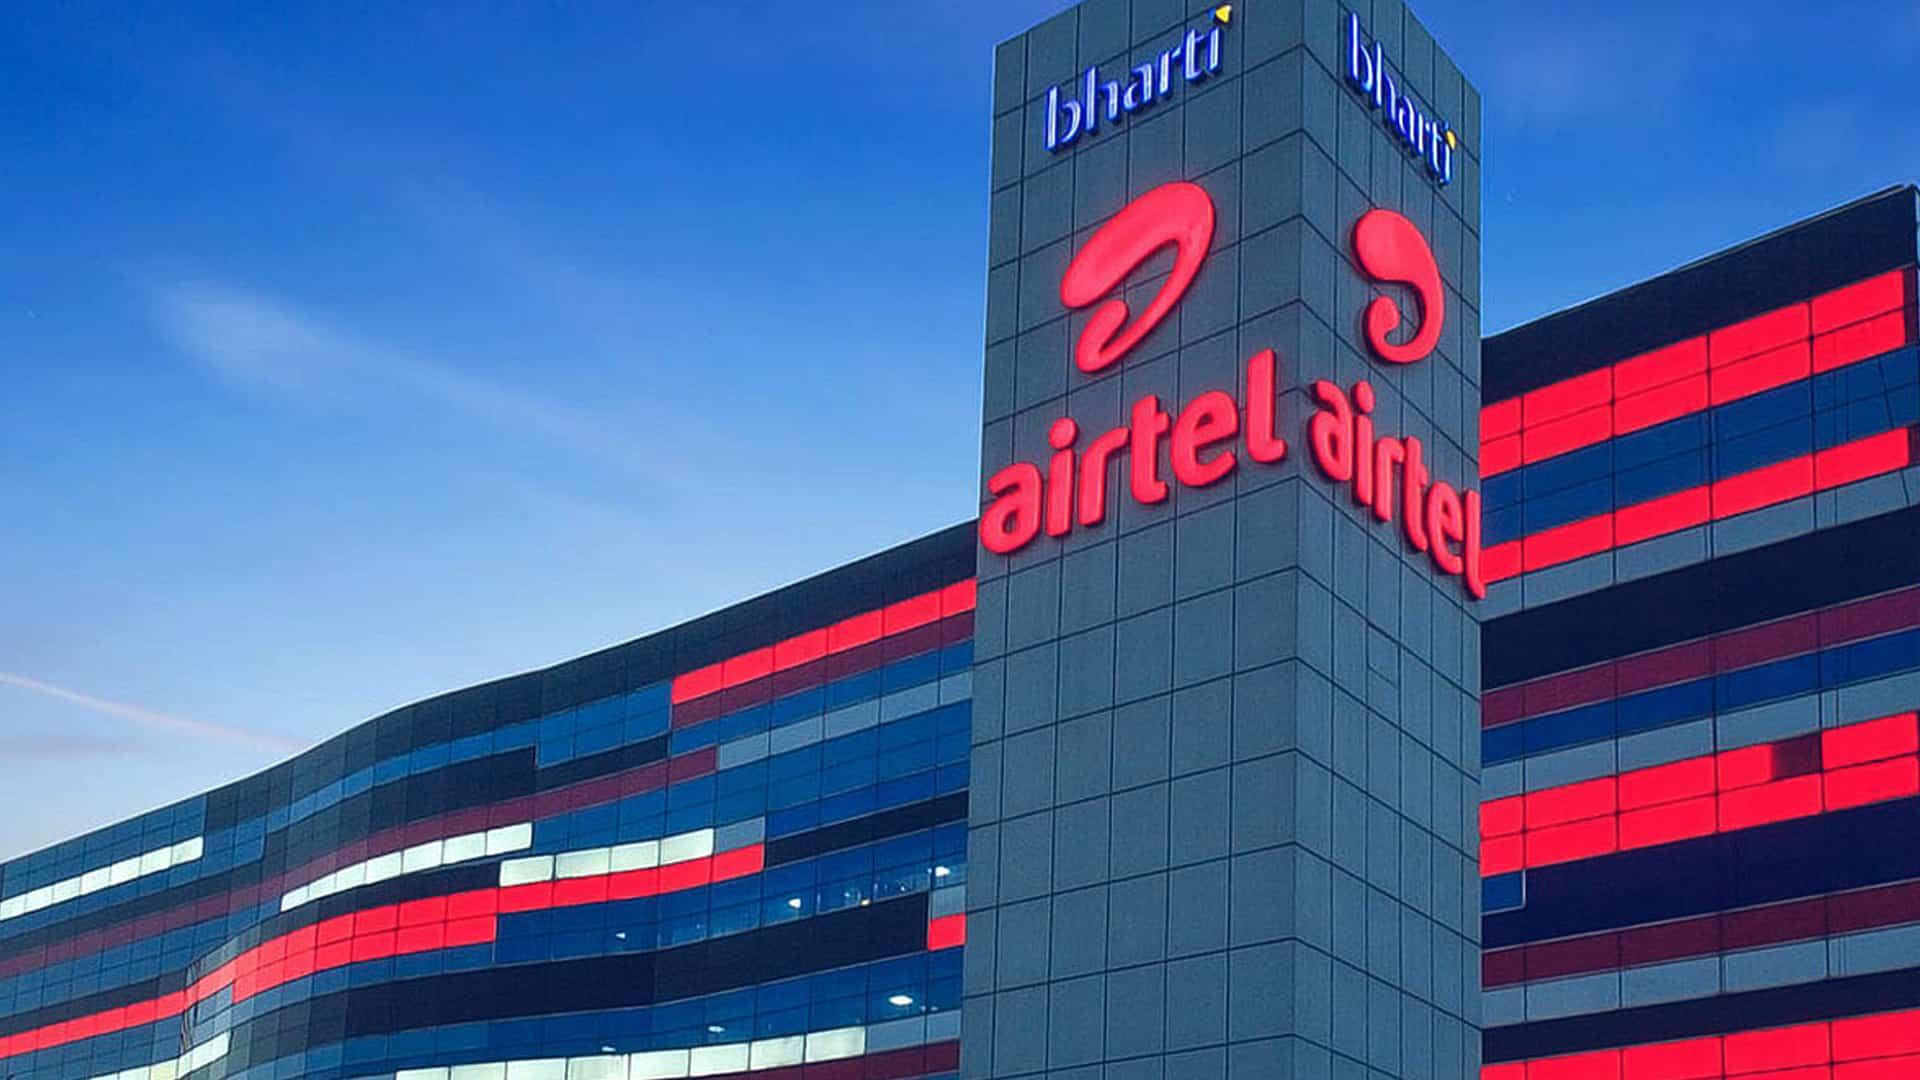 Airtel starts refarming 2G spectrum for 4G services to enhance indoor coverage